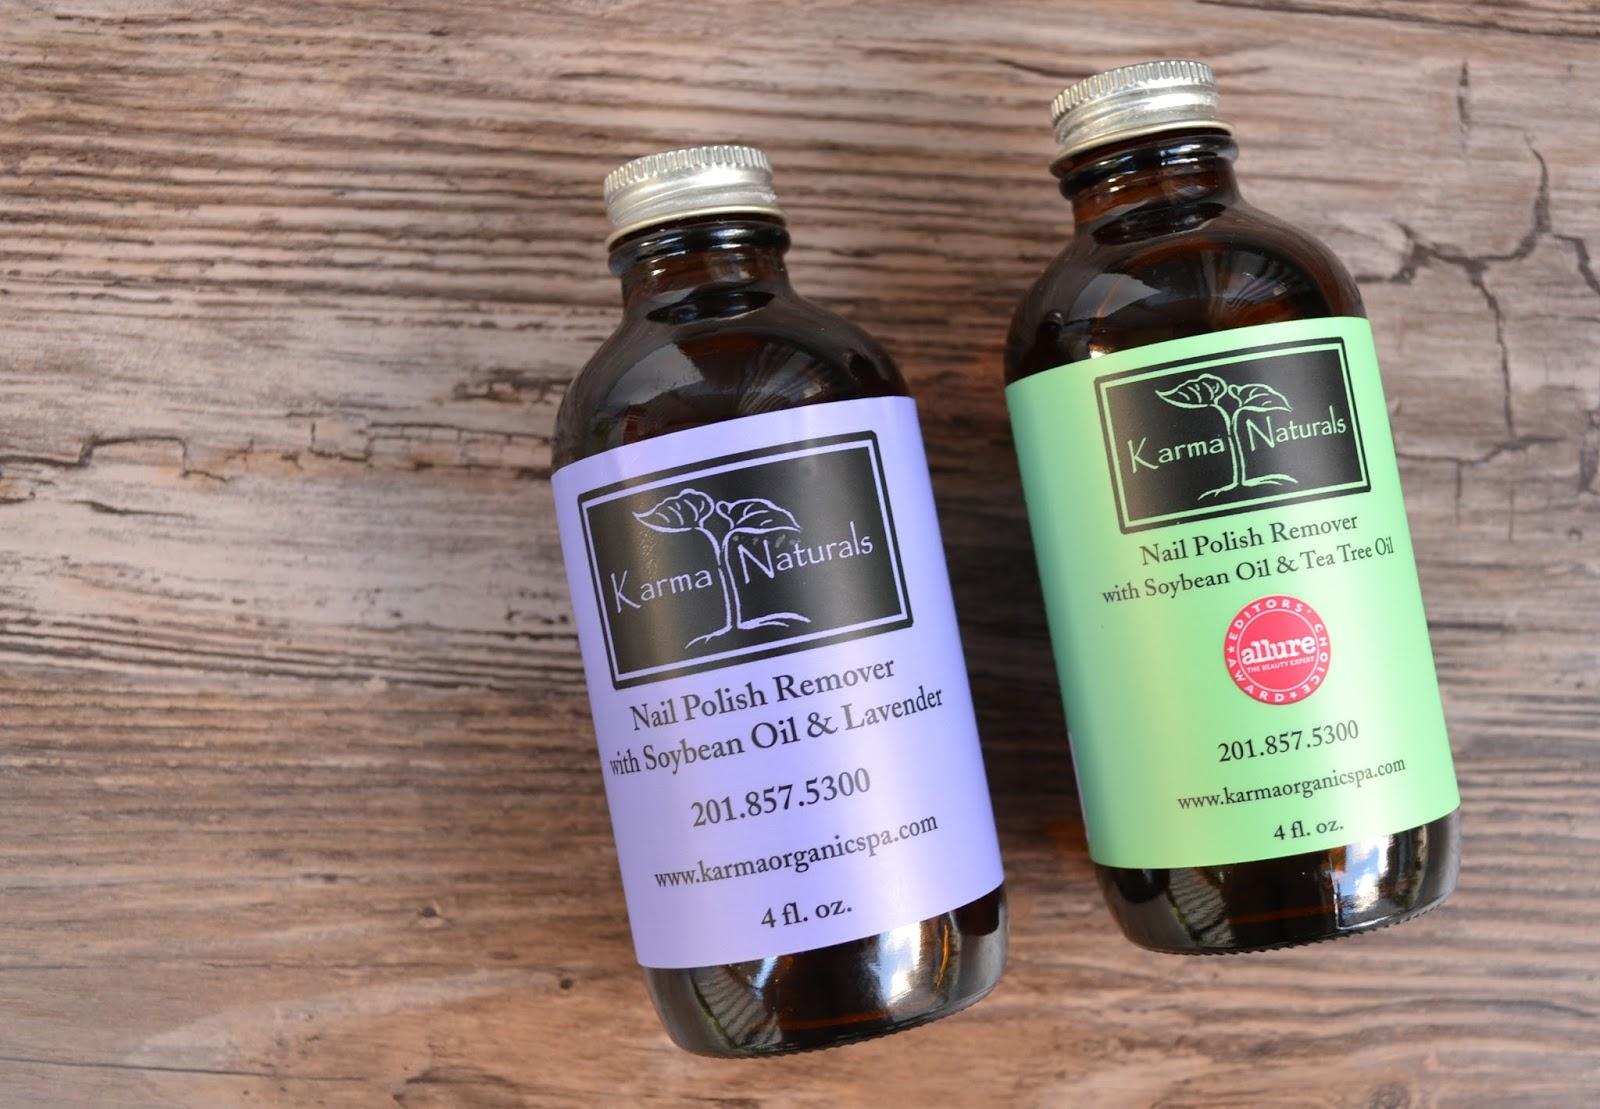 NAILS | Karma Organic Acetone-Free Soybean Nail Polish Remover ...